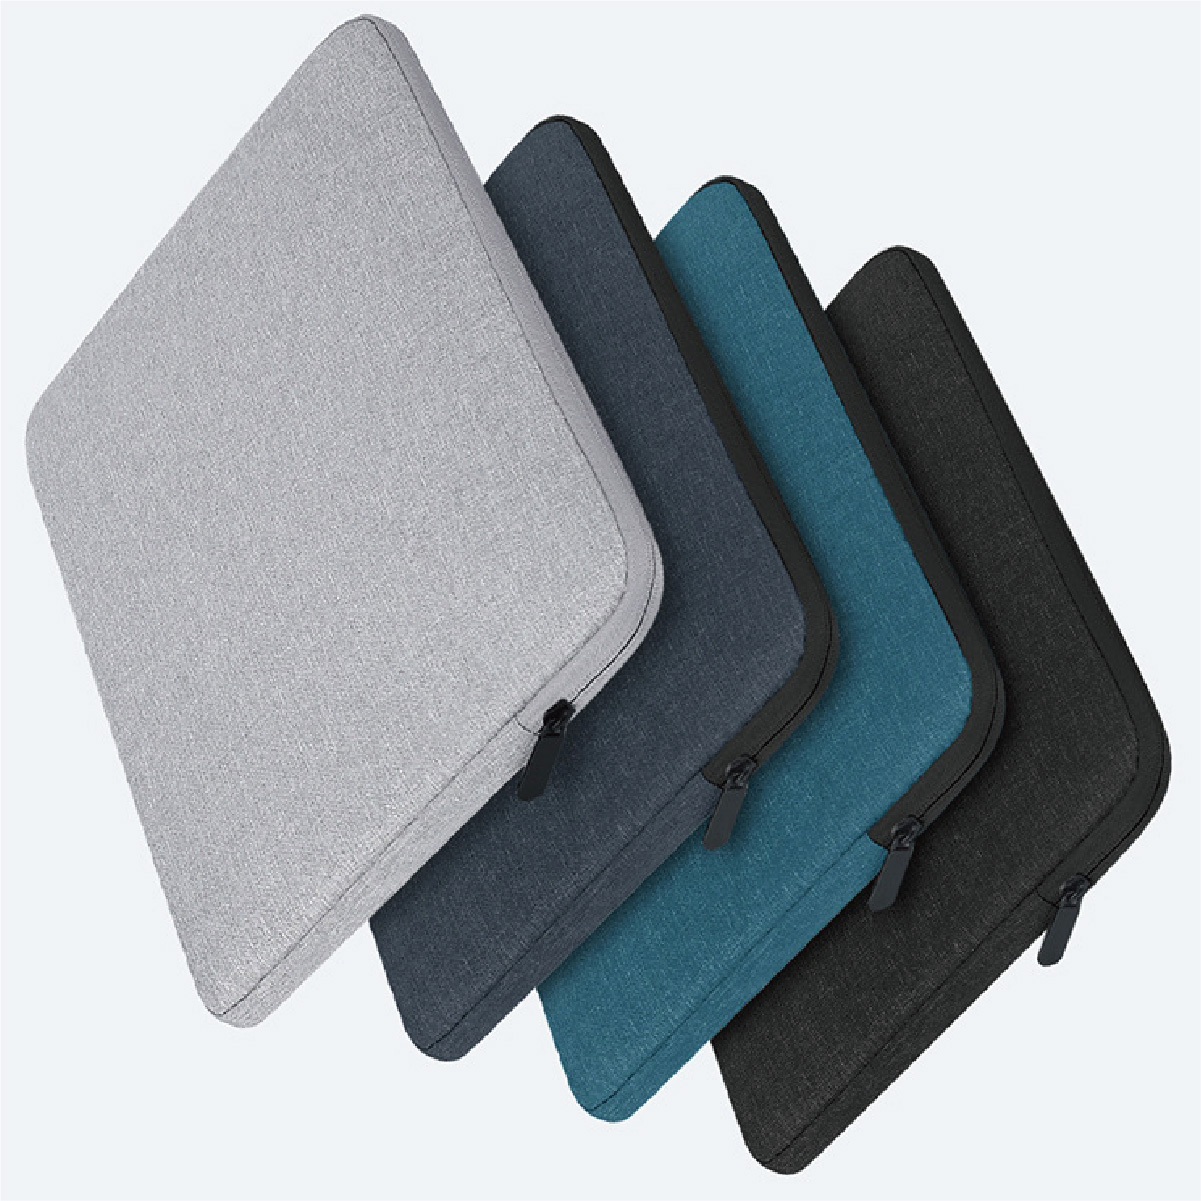 FOX FOUND ノートパソコン ケース macbook pro 15 対応 保護ケース 衝撃吸収 防水 (13.3/15.6インチ)